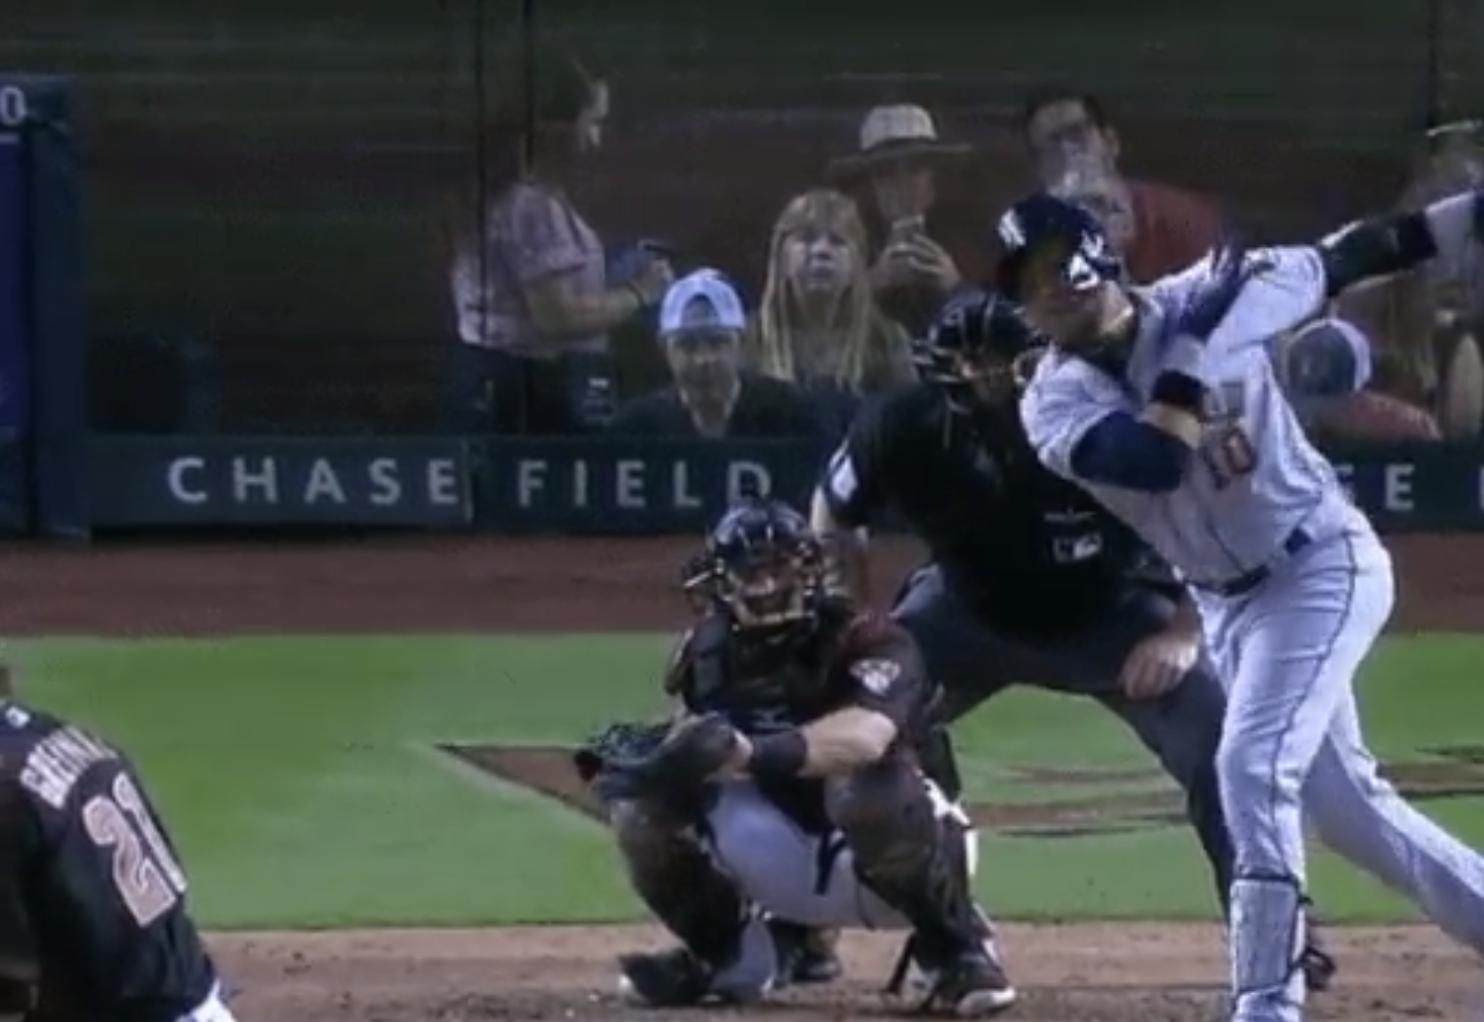 Zack Greinke embarrasses Yuli Gurriel with 67-mph eephus curveball